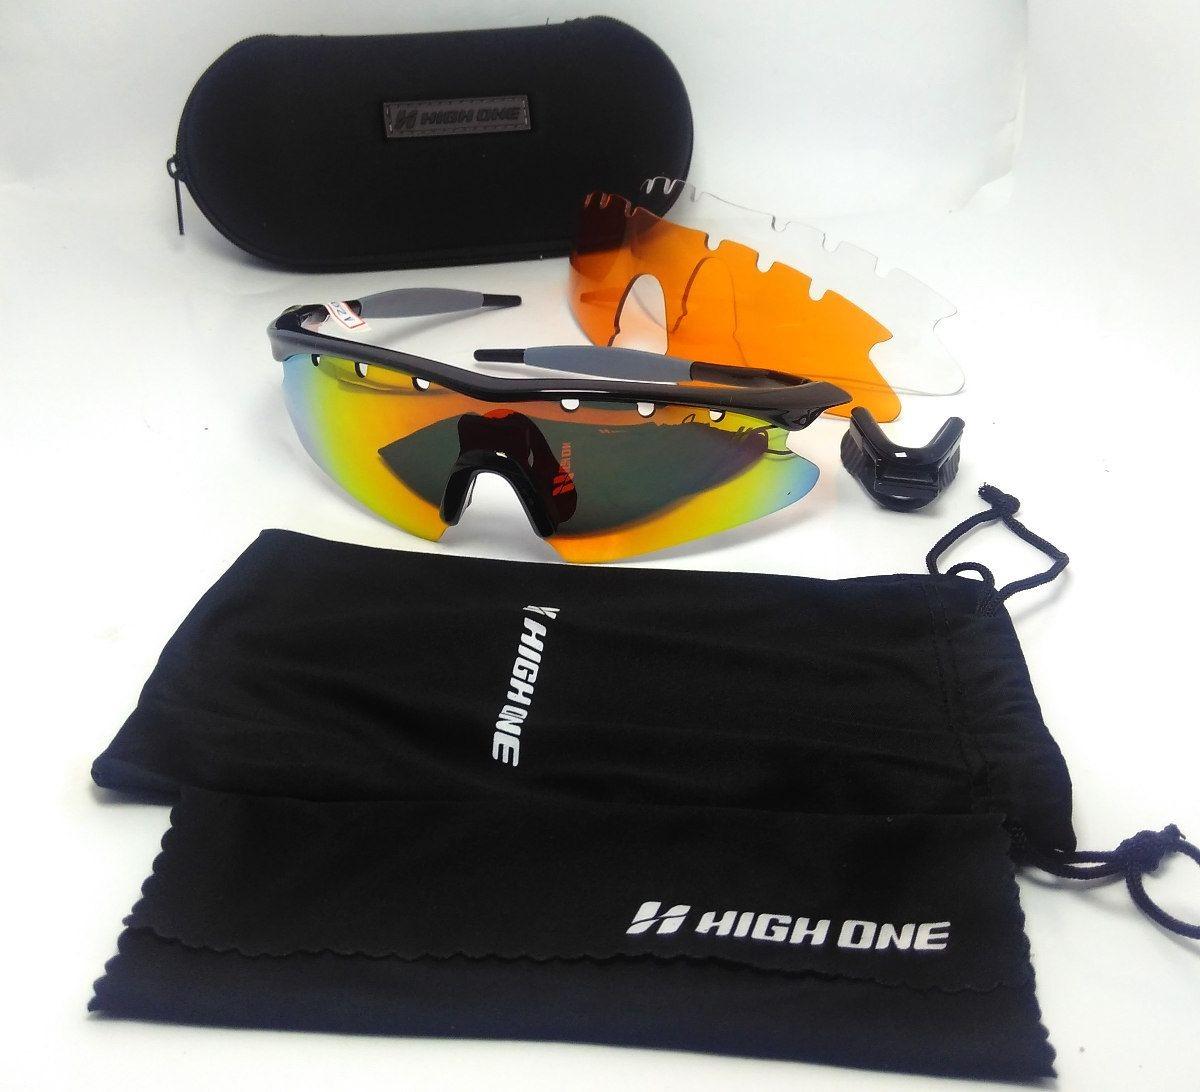 350c89aefbd8f óculos de ciclismo high one fusion c  3 lentes + case. Carregando zoom.